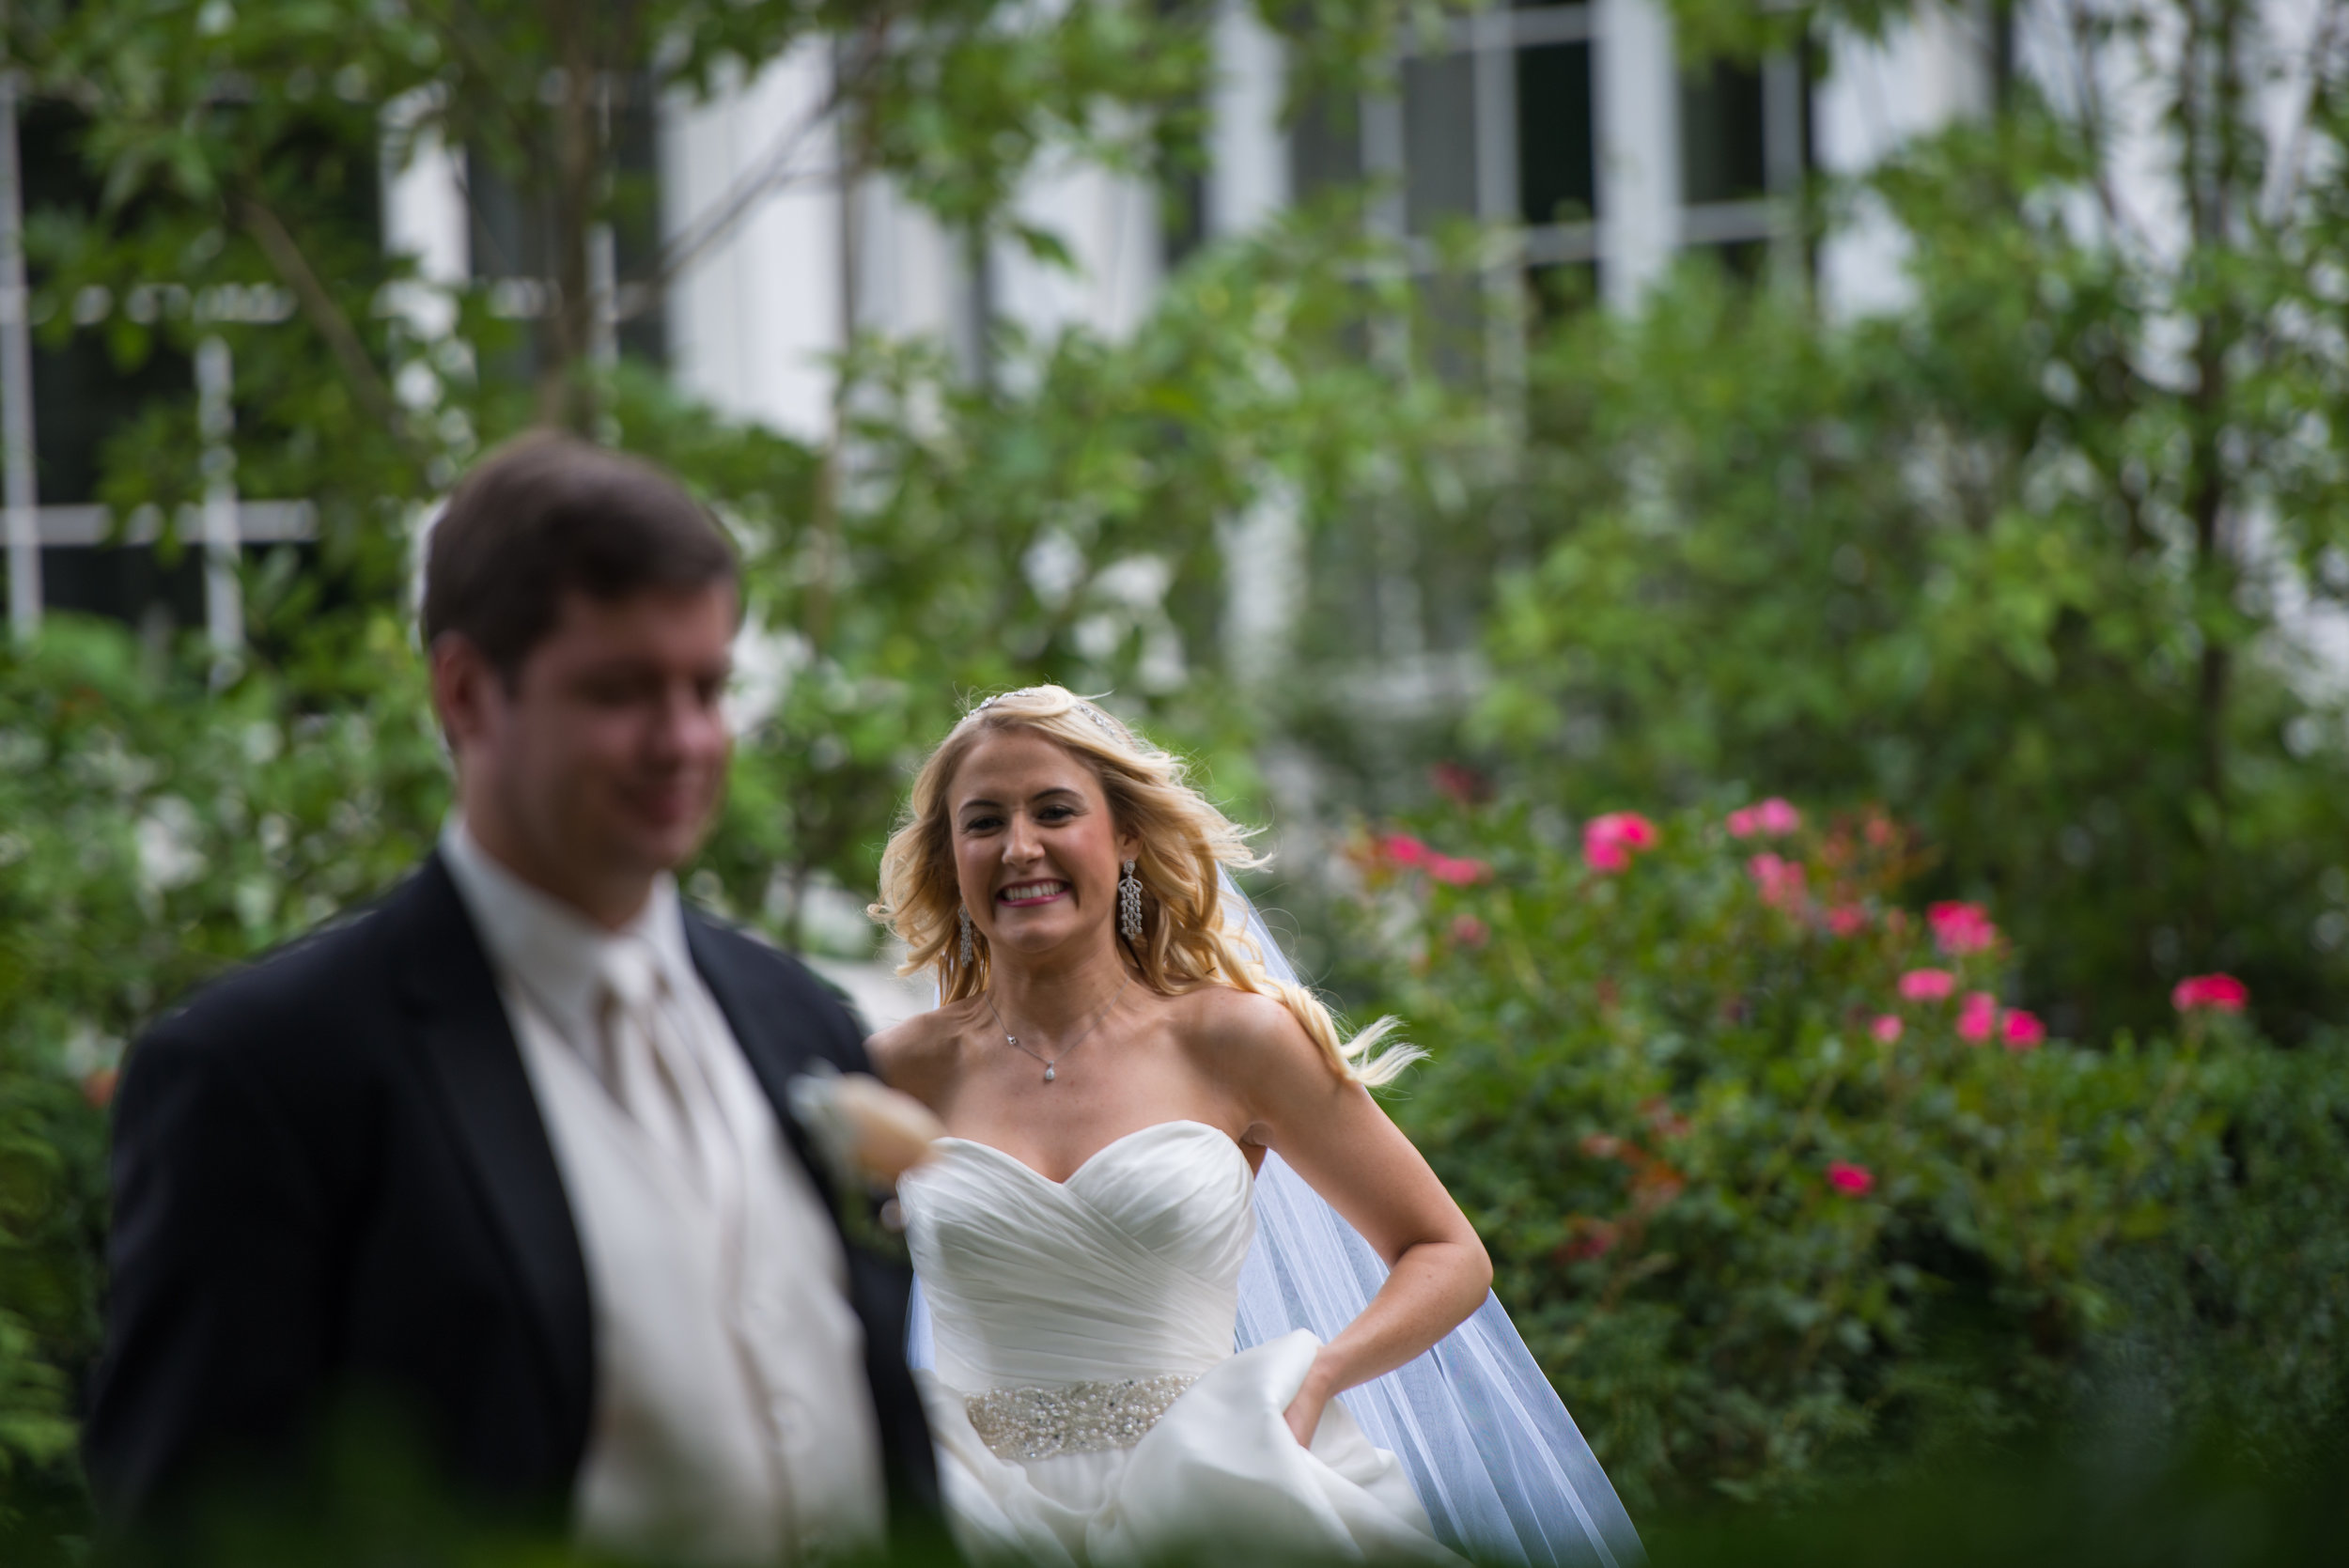 Wedding First Look Photos00920.jpg